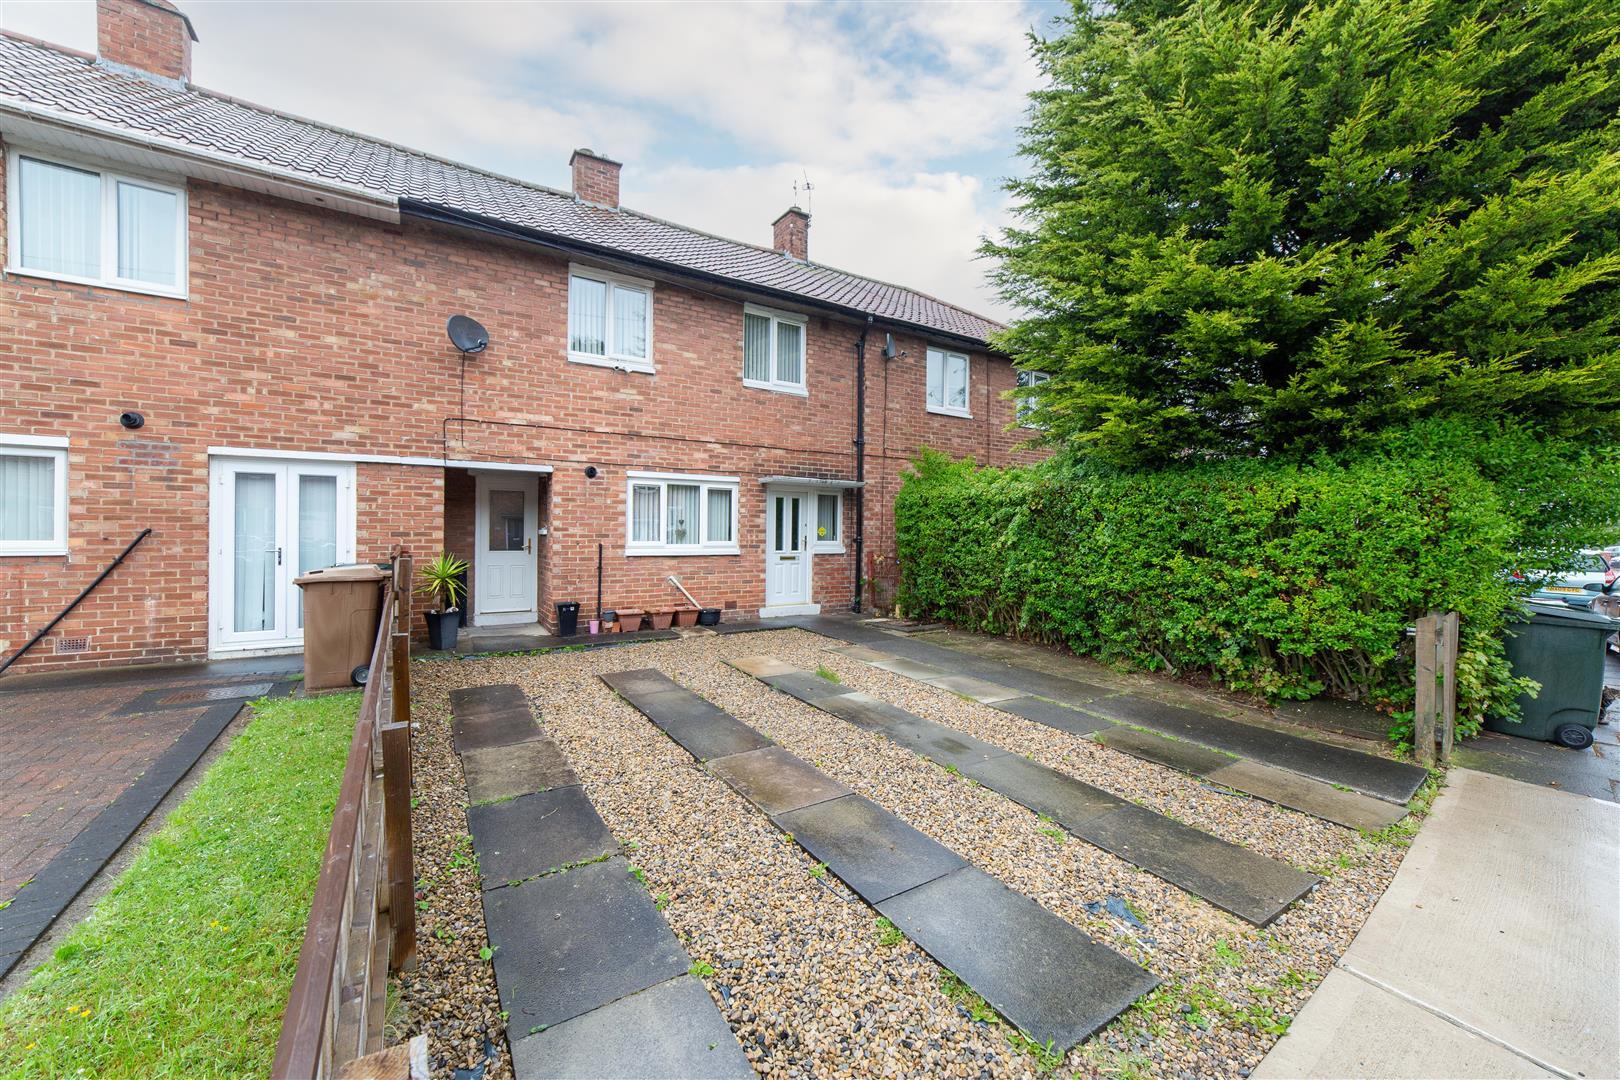 3 bed terraced house for sale in Bowman Drive, Cramlington, NE23